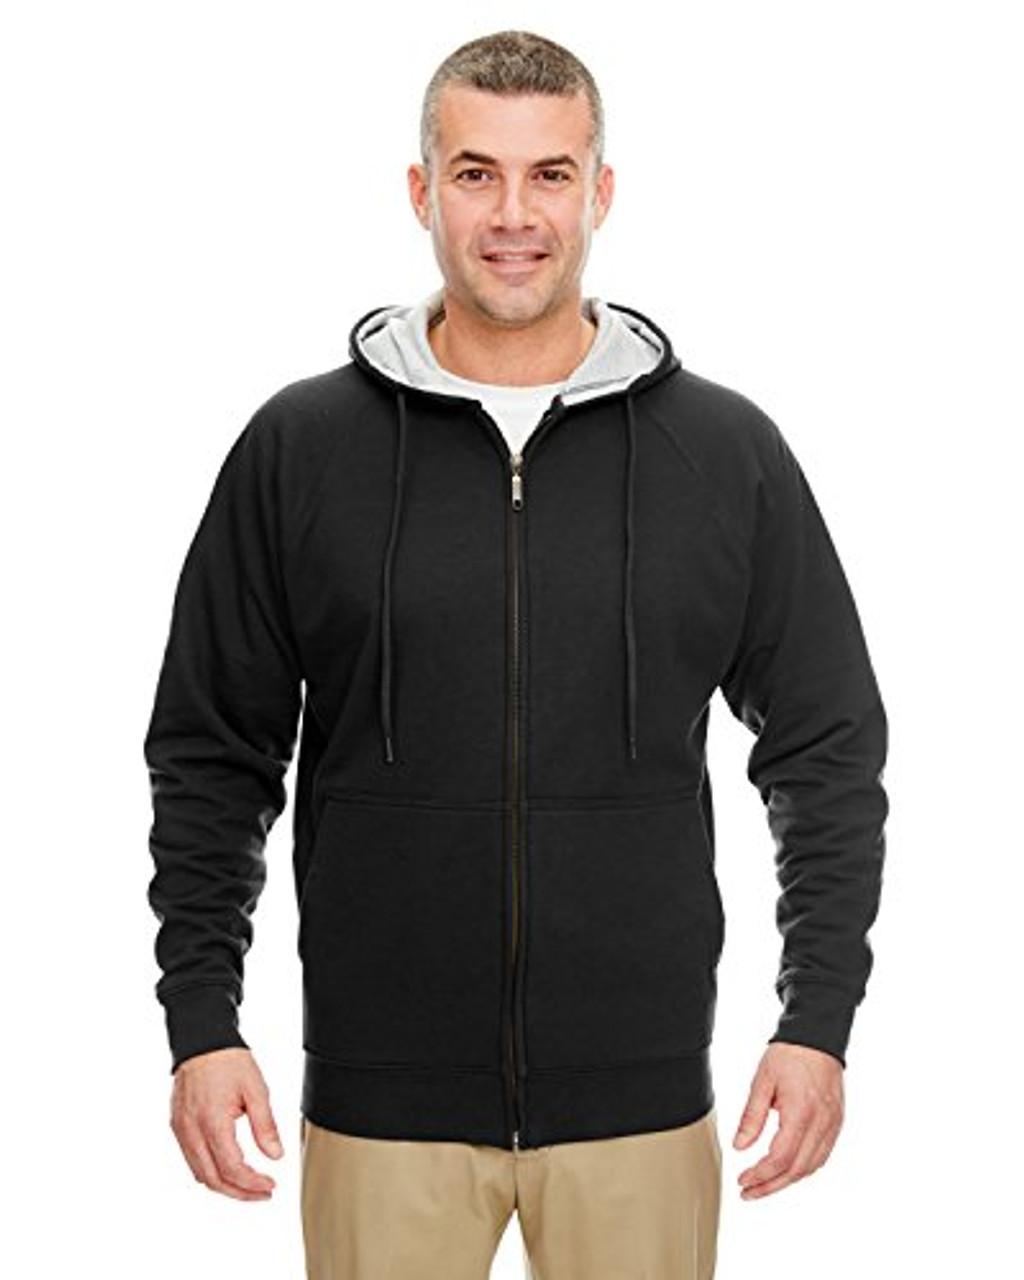 UltraClub Mens Rugged Wear Thermal-Lined Full-Zip Hoody